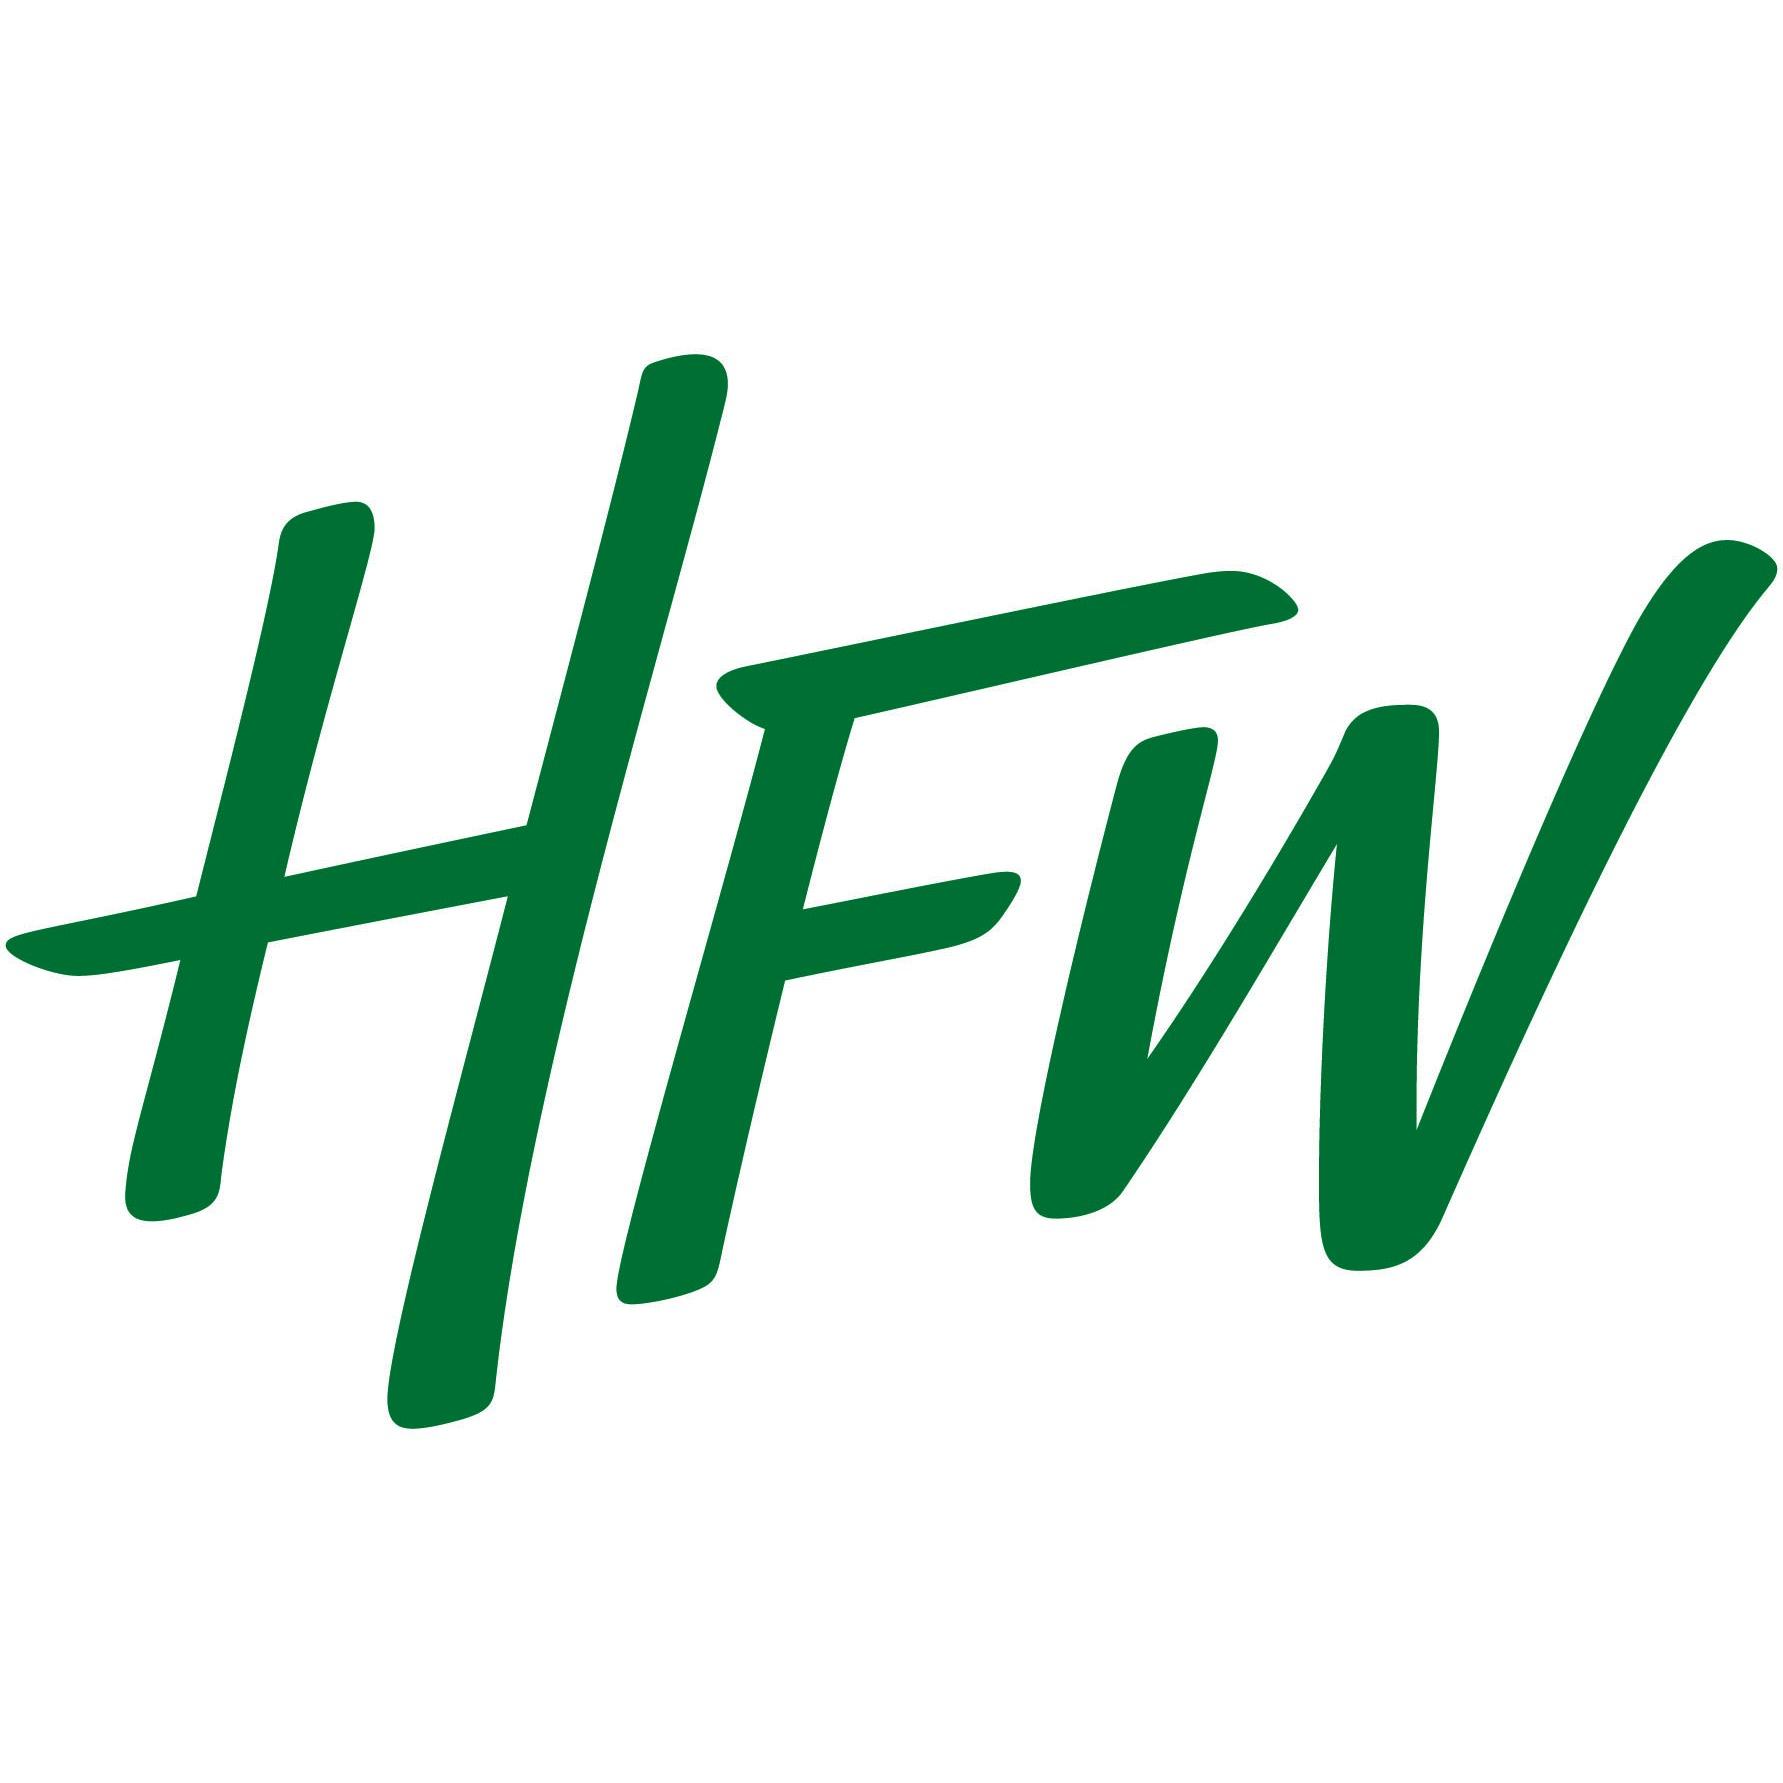 the HFW logo.